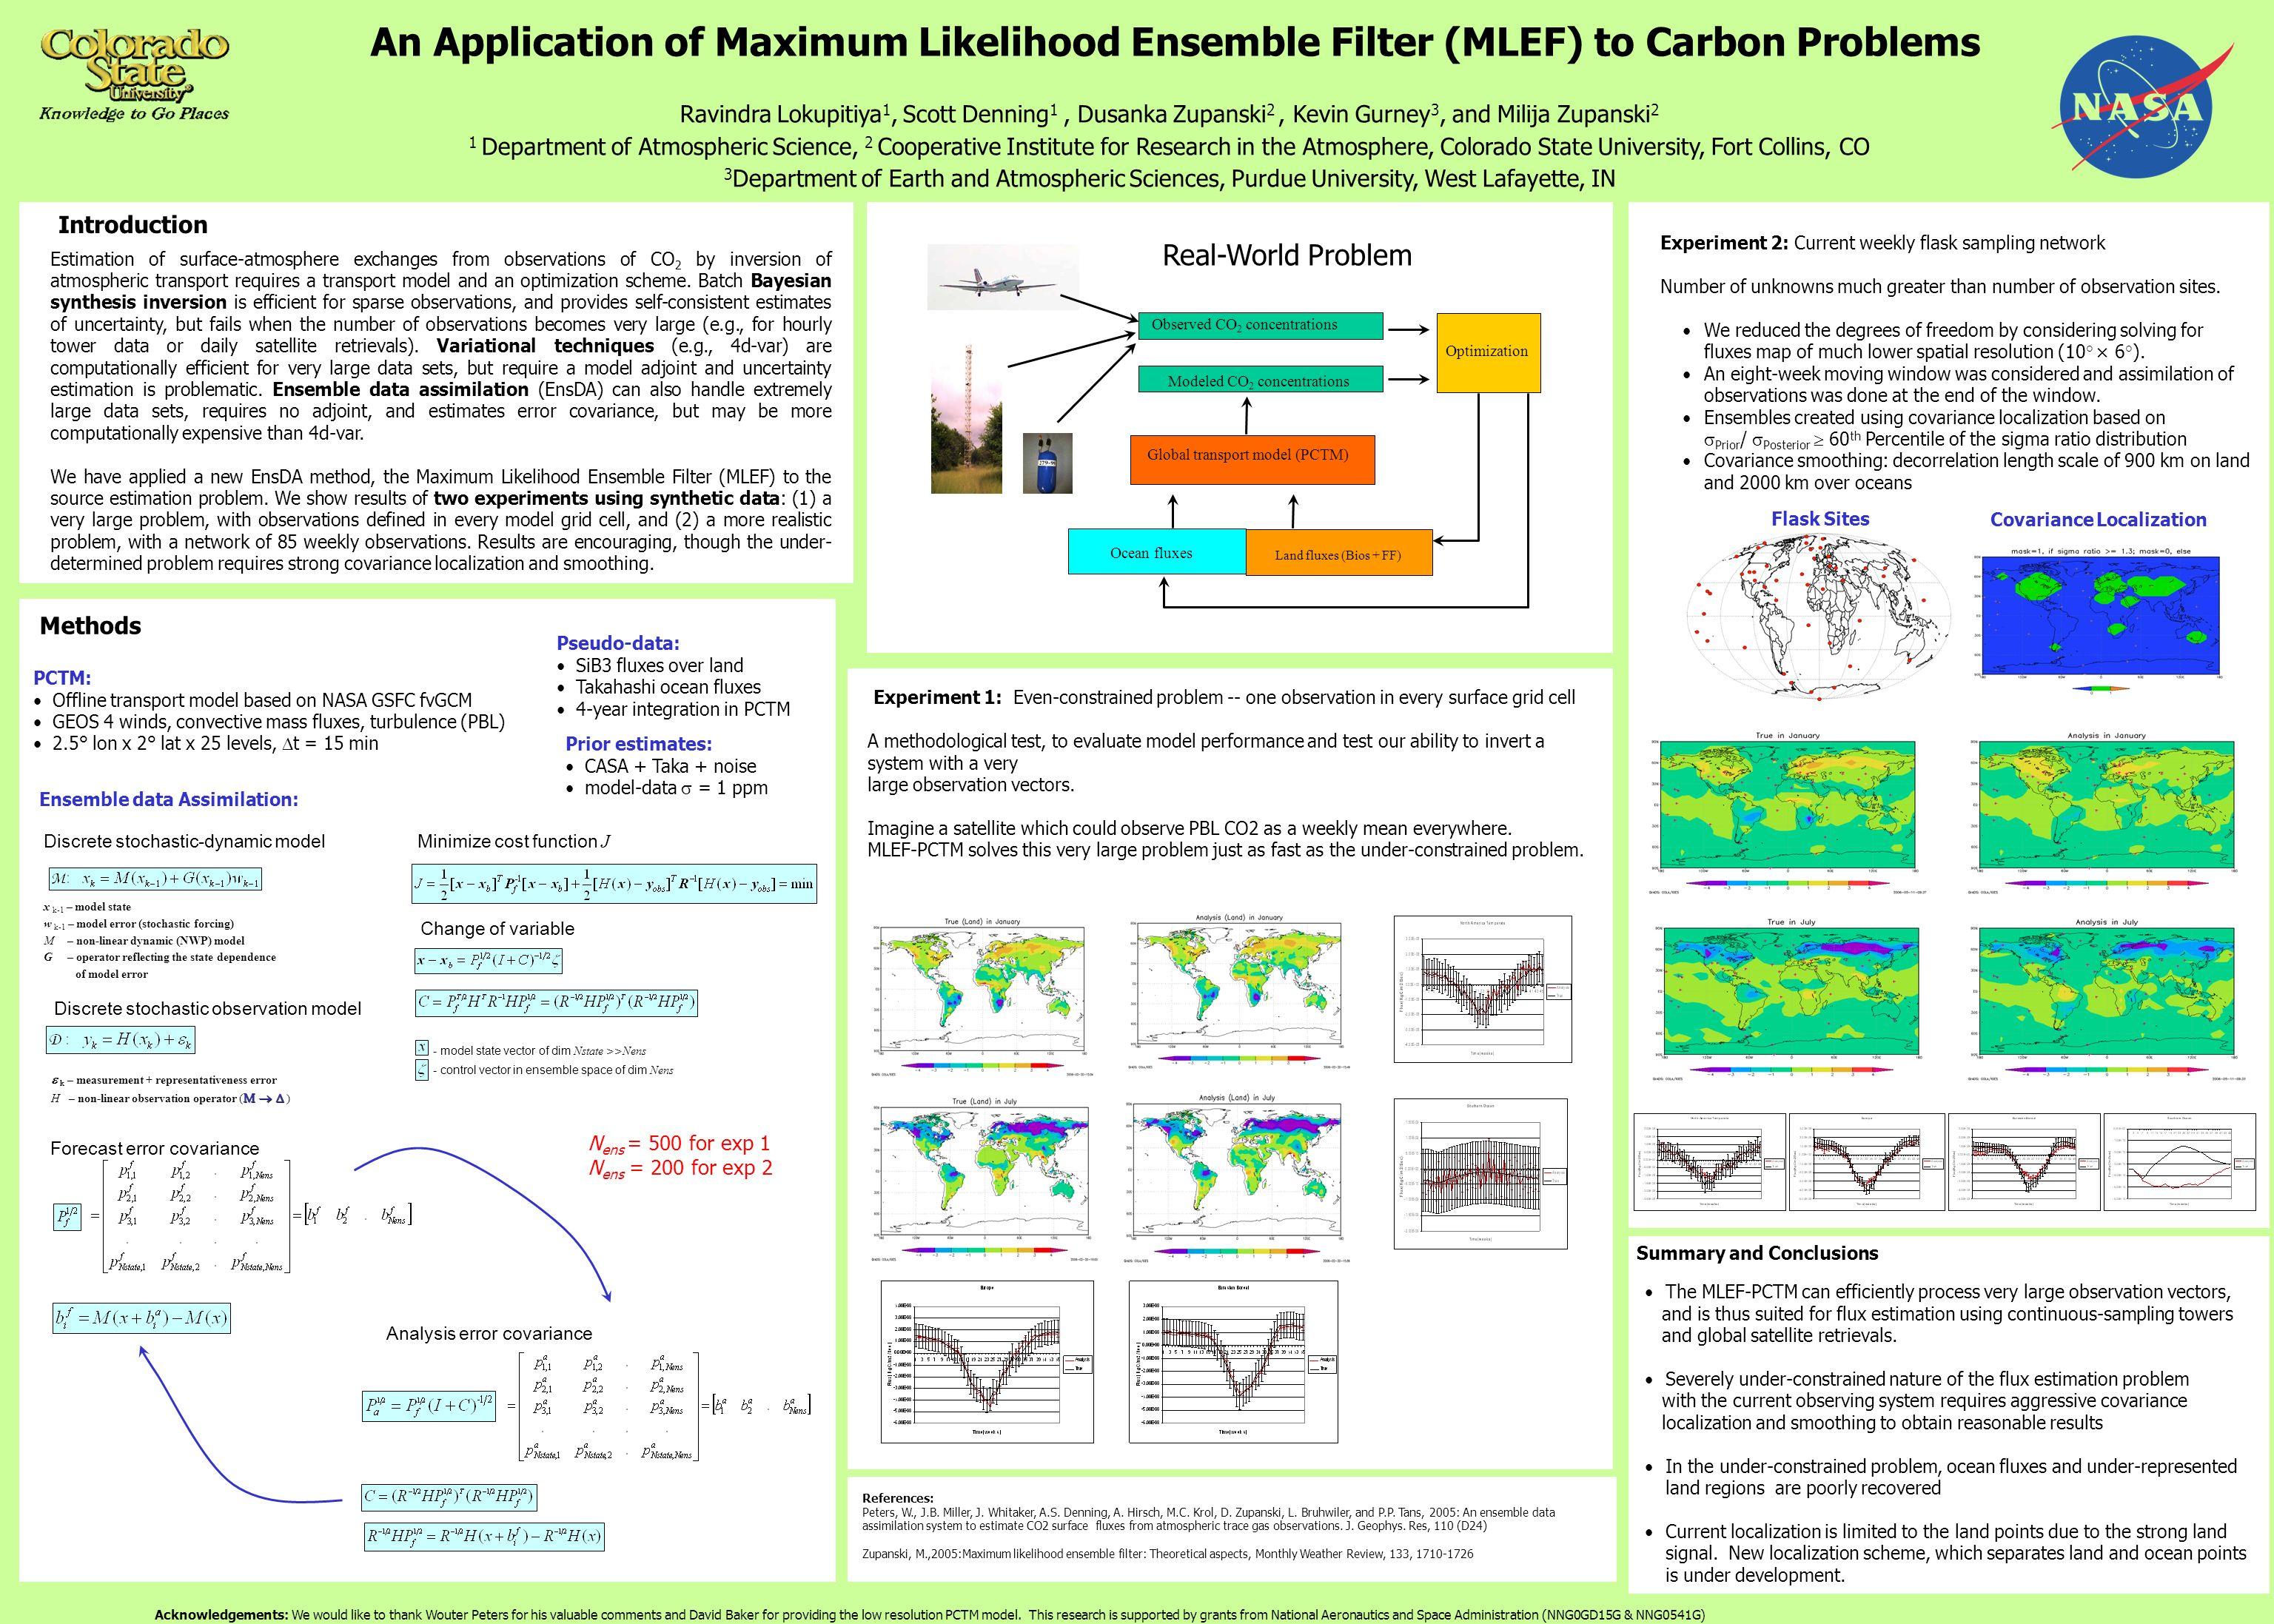 Lication Of Maximum Likelihood Ensemble Filter Mlef To Carbon Problems Ravindra Lokupitiya 1 Scott Denning Dusanka Zupanski 2 Kevin Gurney 3